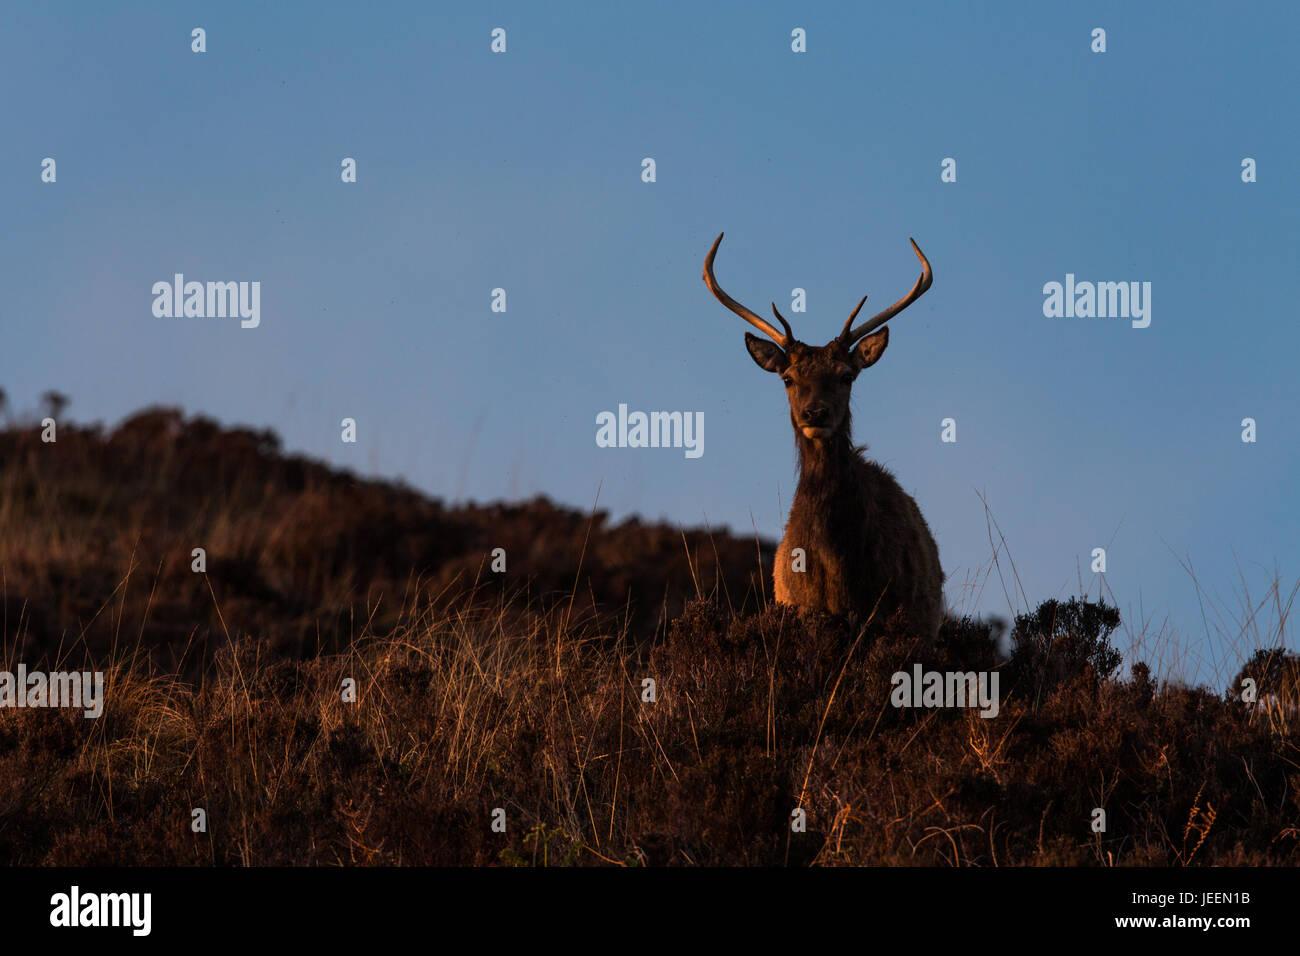 Red Deer stag on moorland, Applecross, Scotland, UK - Stock Image